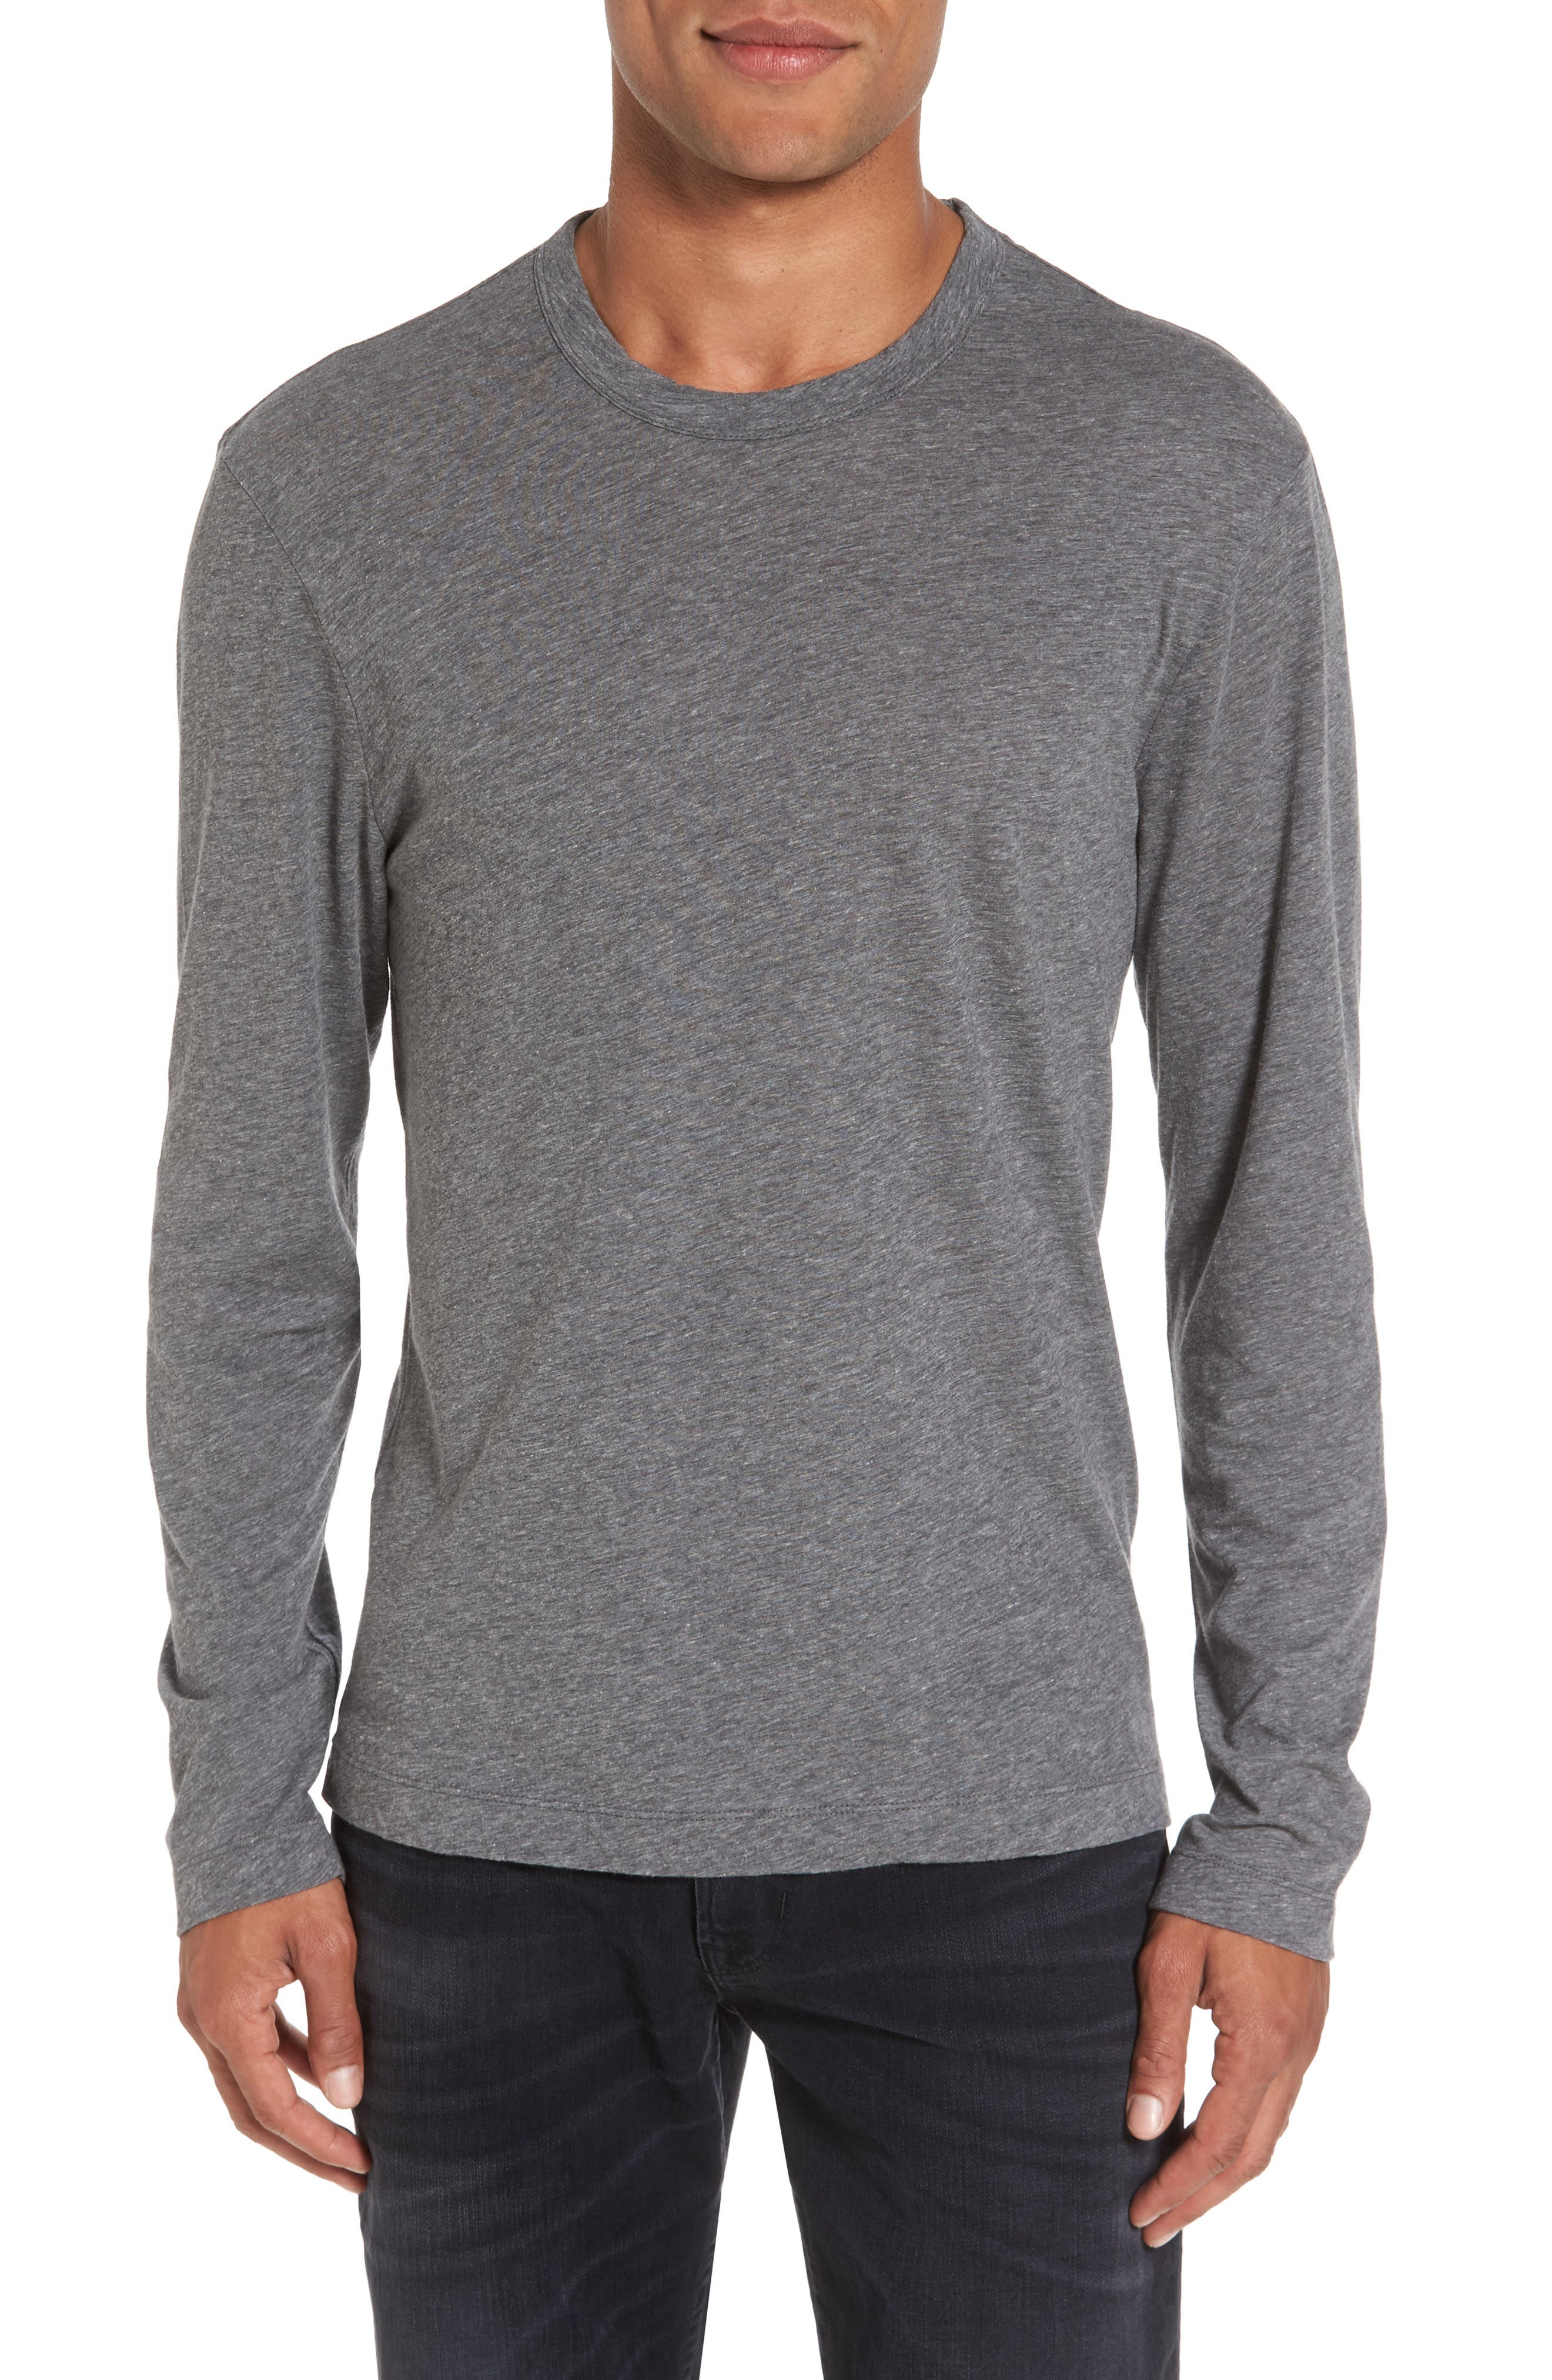 James Perse Mélange Knit Long Sleeve T-Shirt